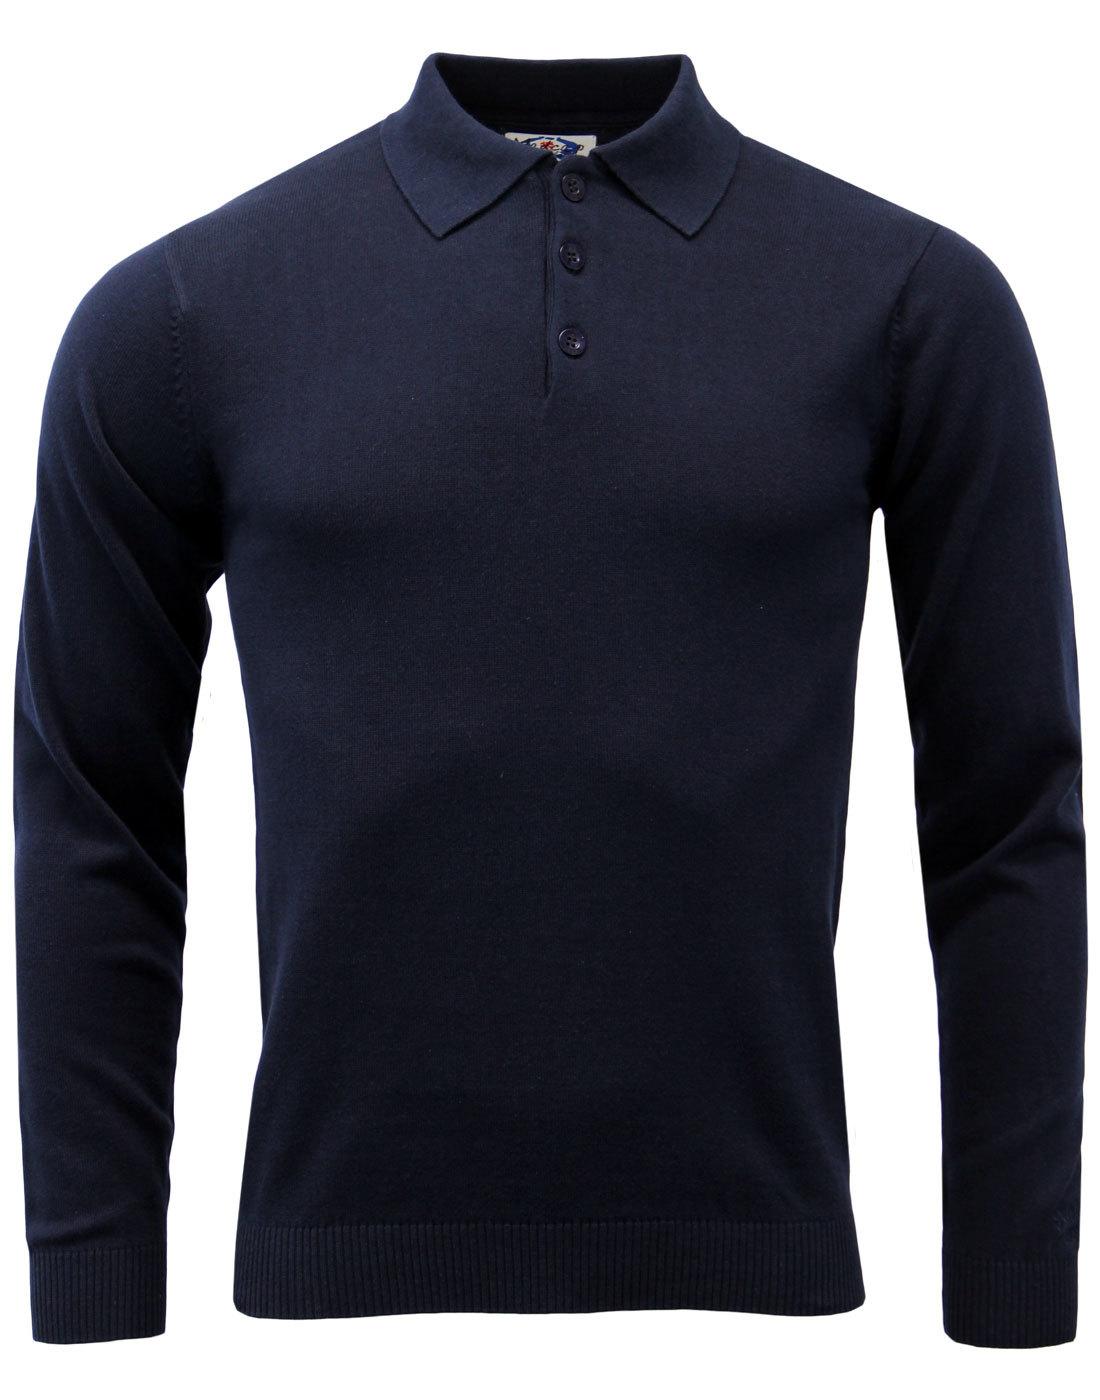 Brando MADCAP ENGLAND 1960s Mod Knitted Polo (N)